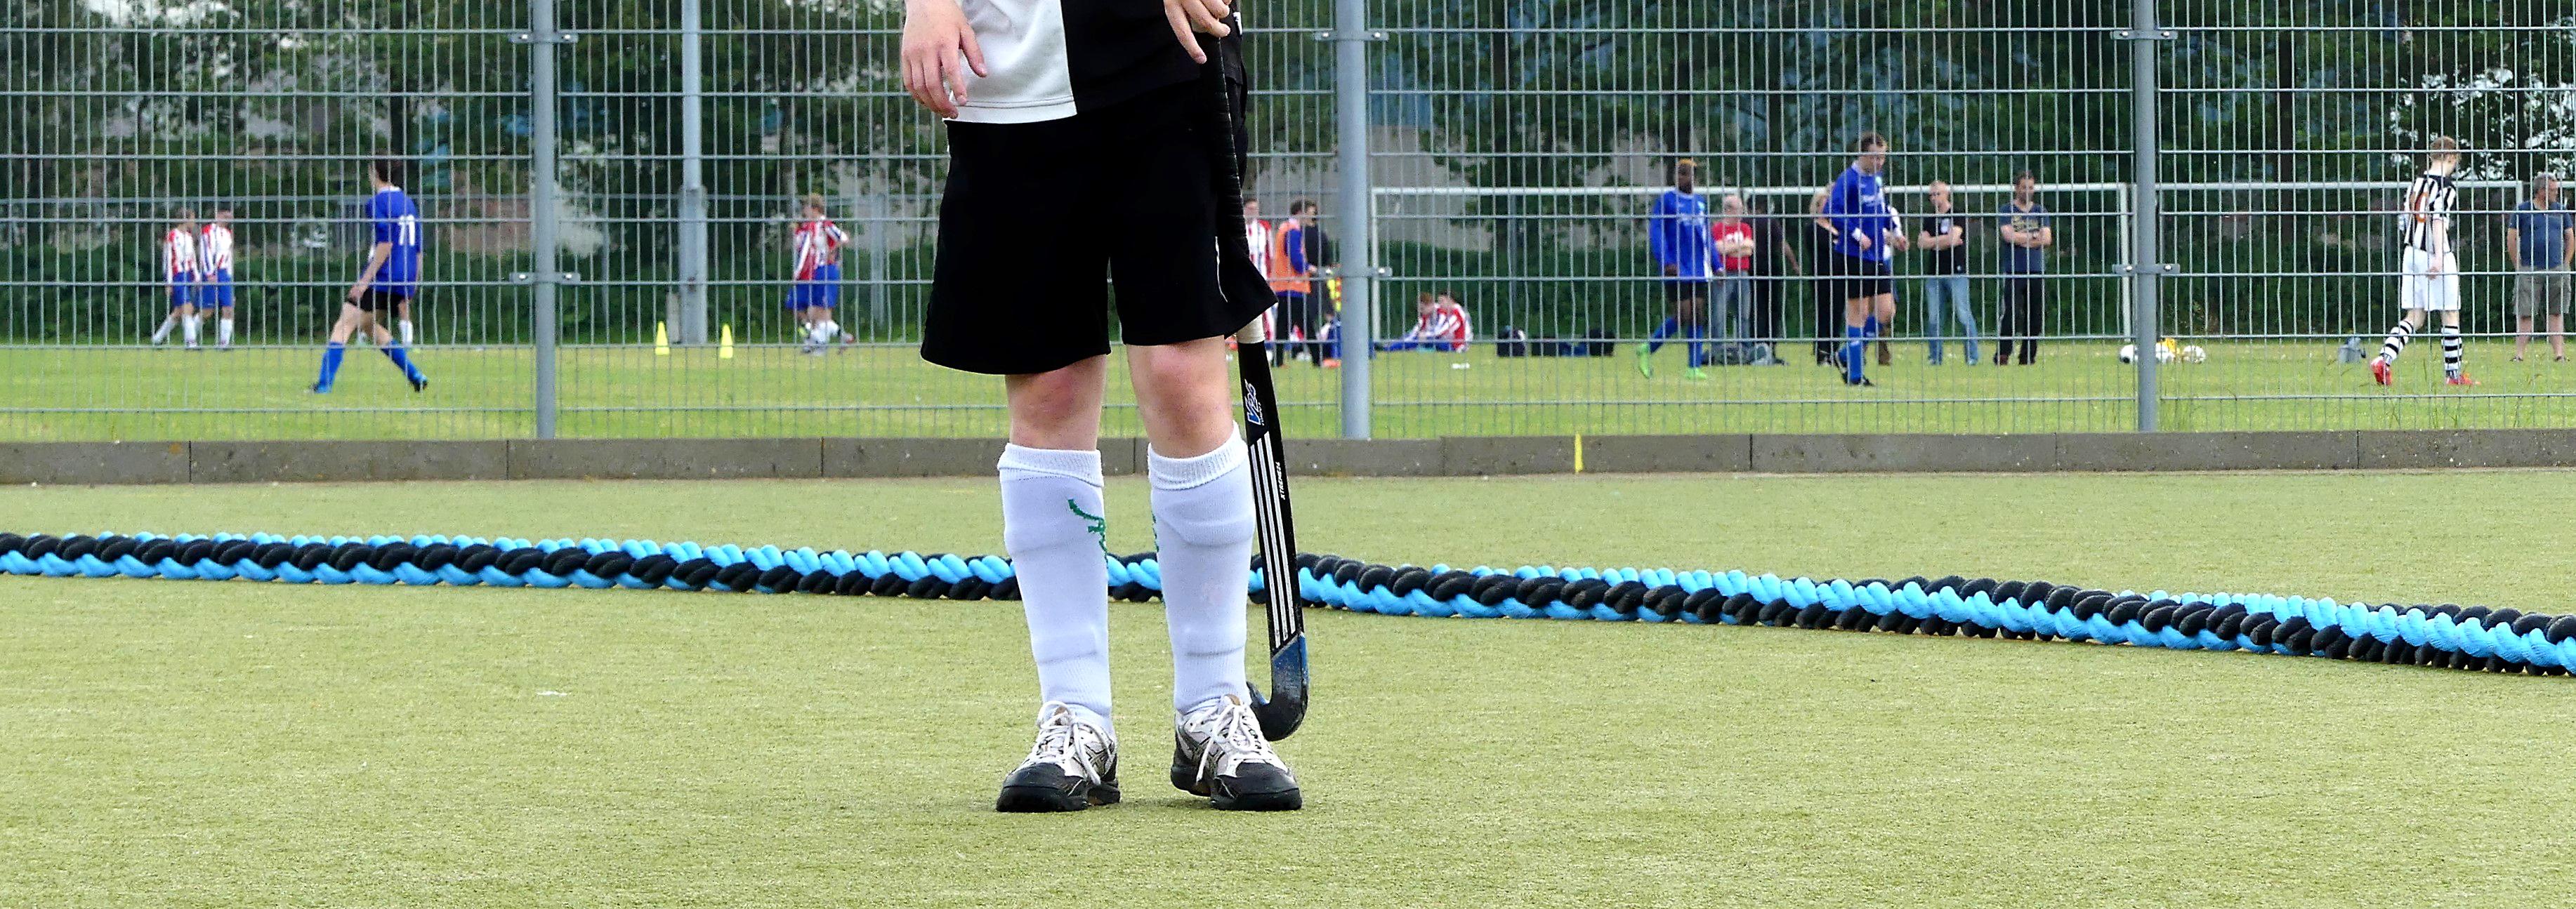 Sporttouwen